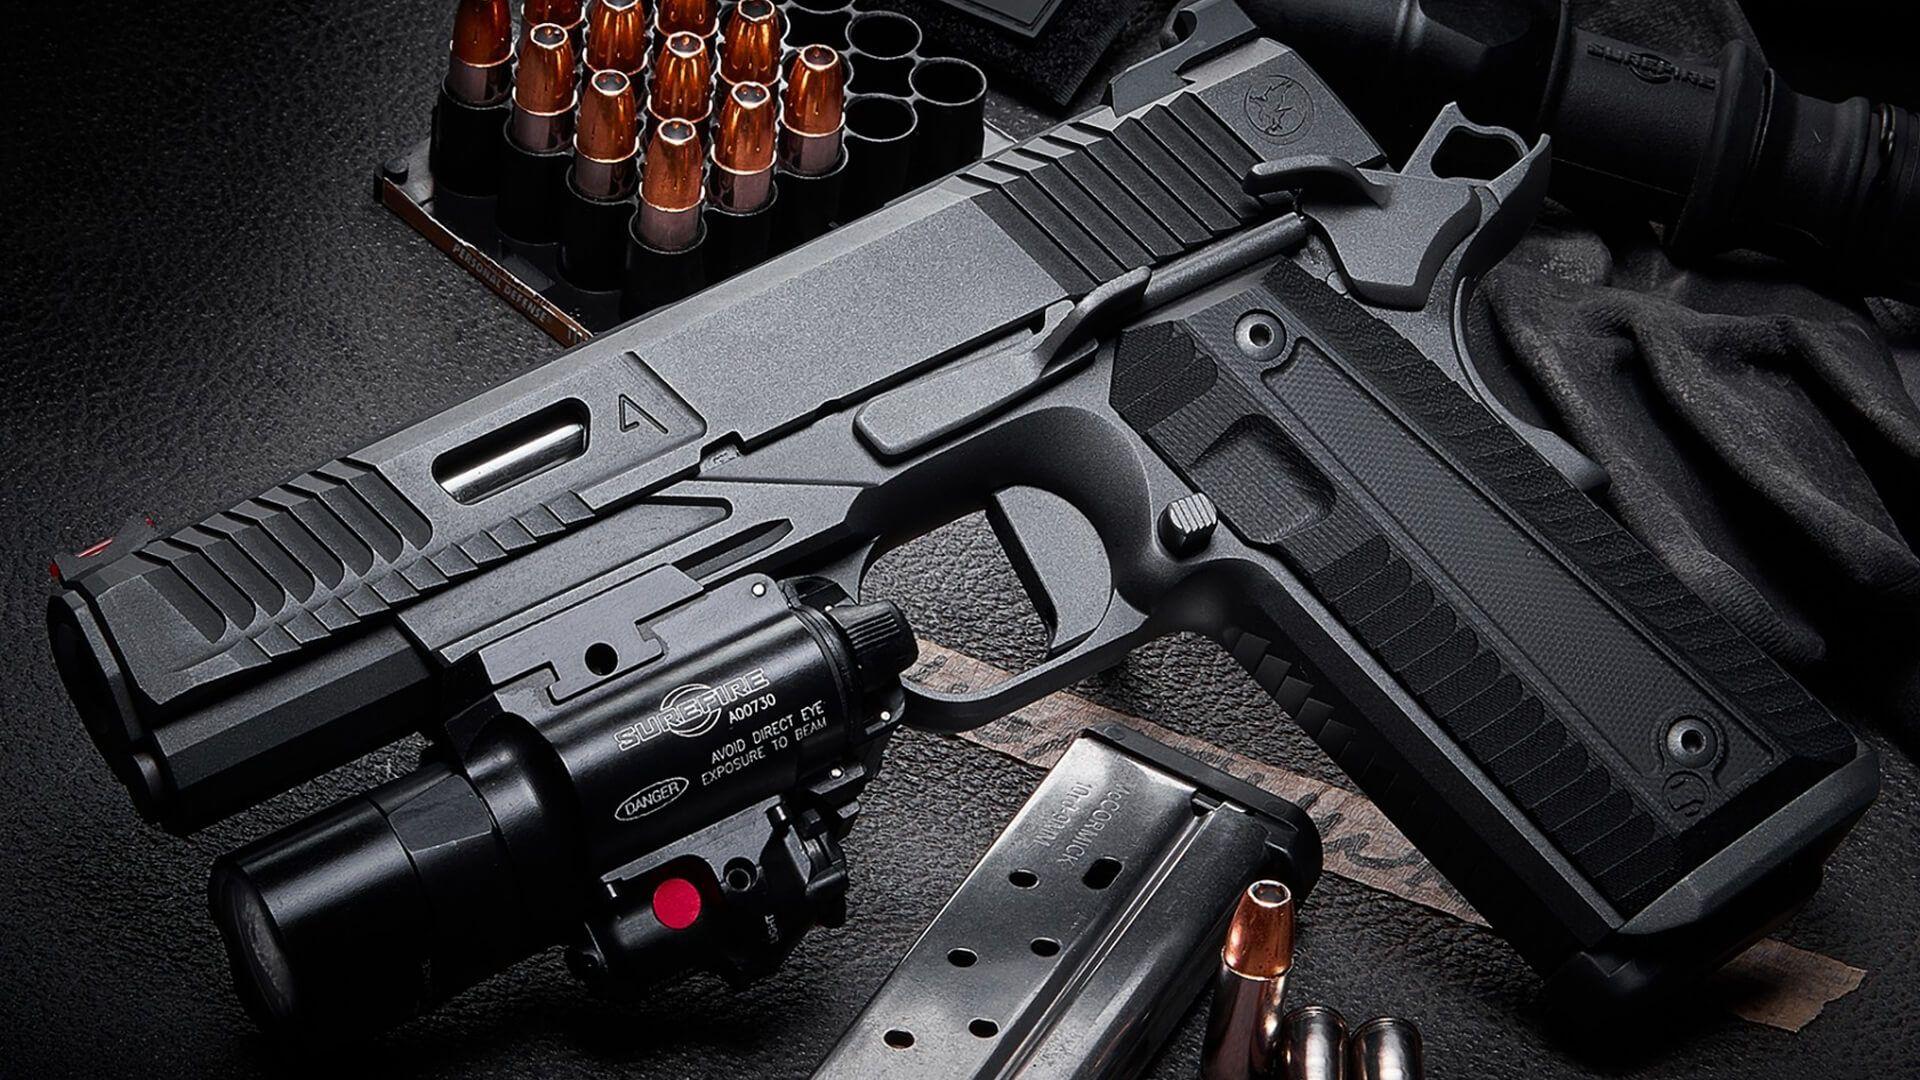 Nighthawk Custom 1911 Agent2 in 9mm and 45 ACP. Visit www ...